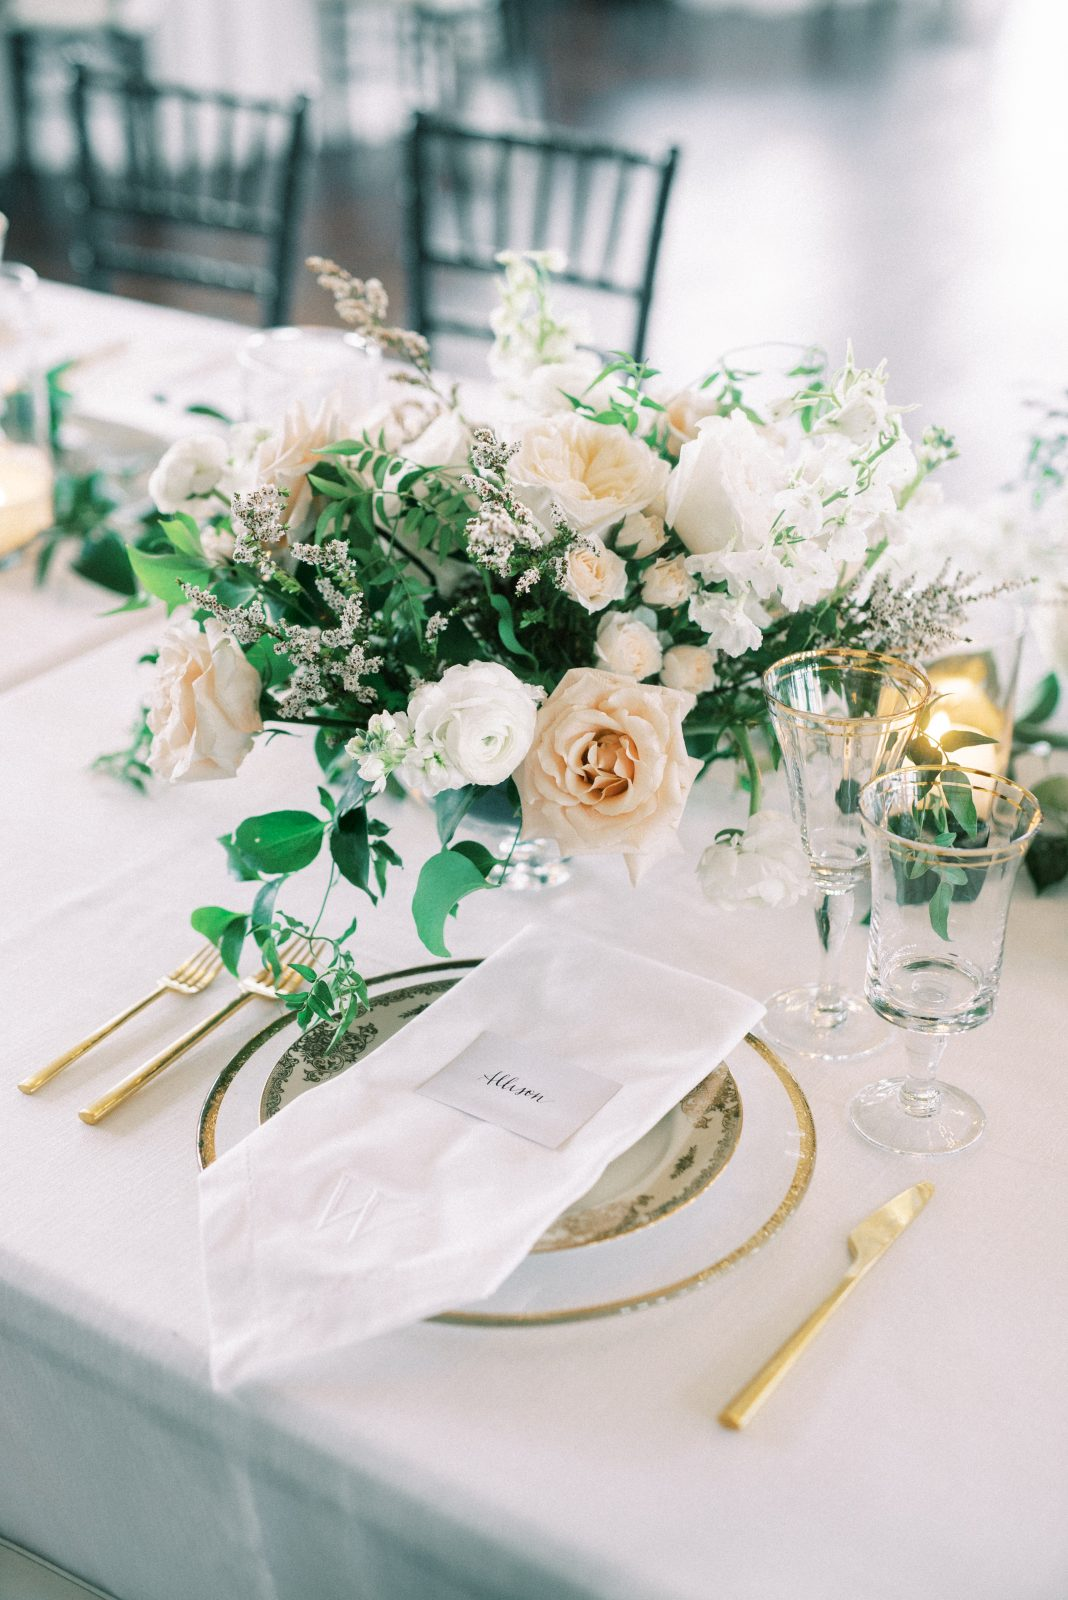 Gold wedding flatware